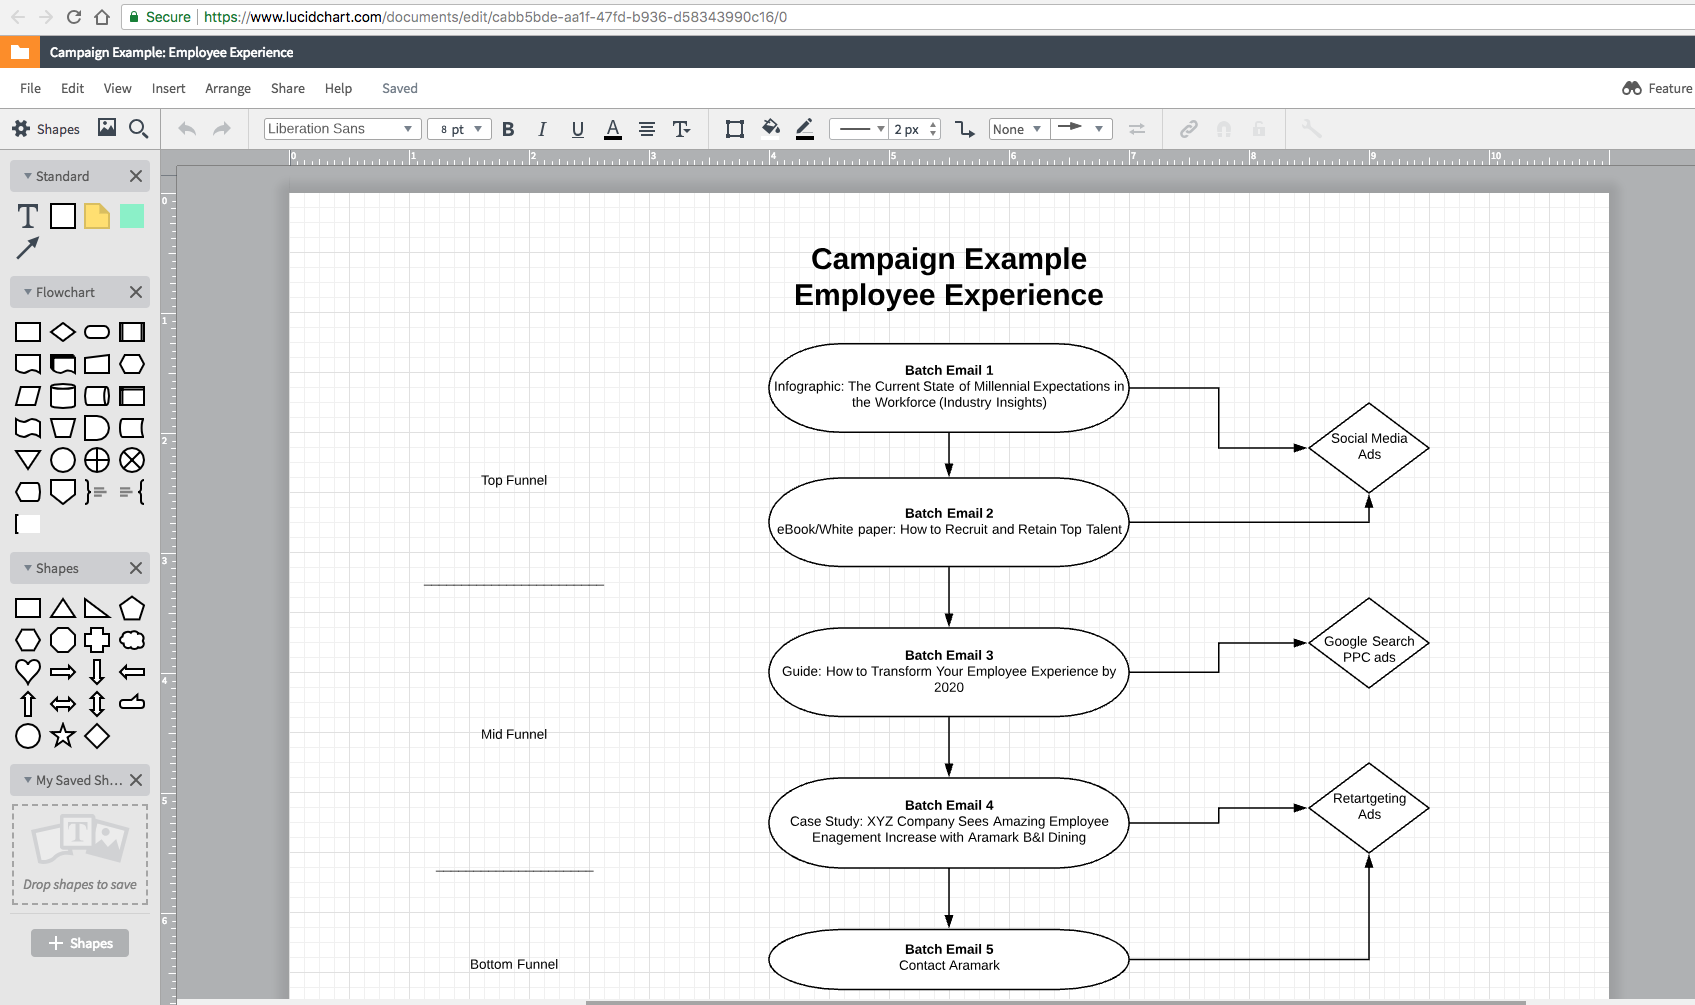 lucid-chart-digital-marketing-tool